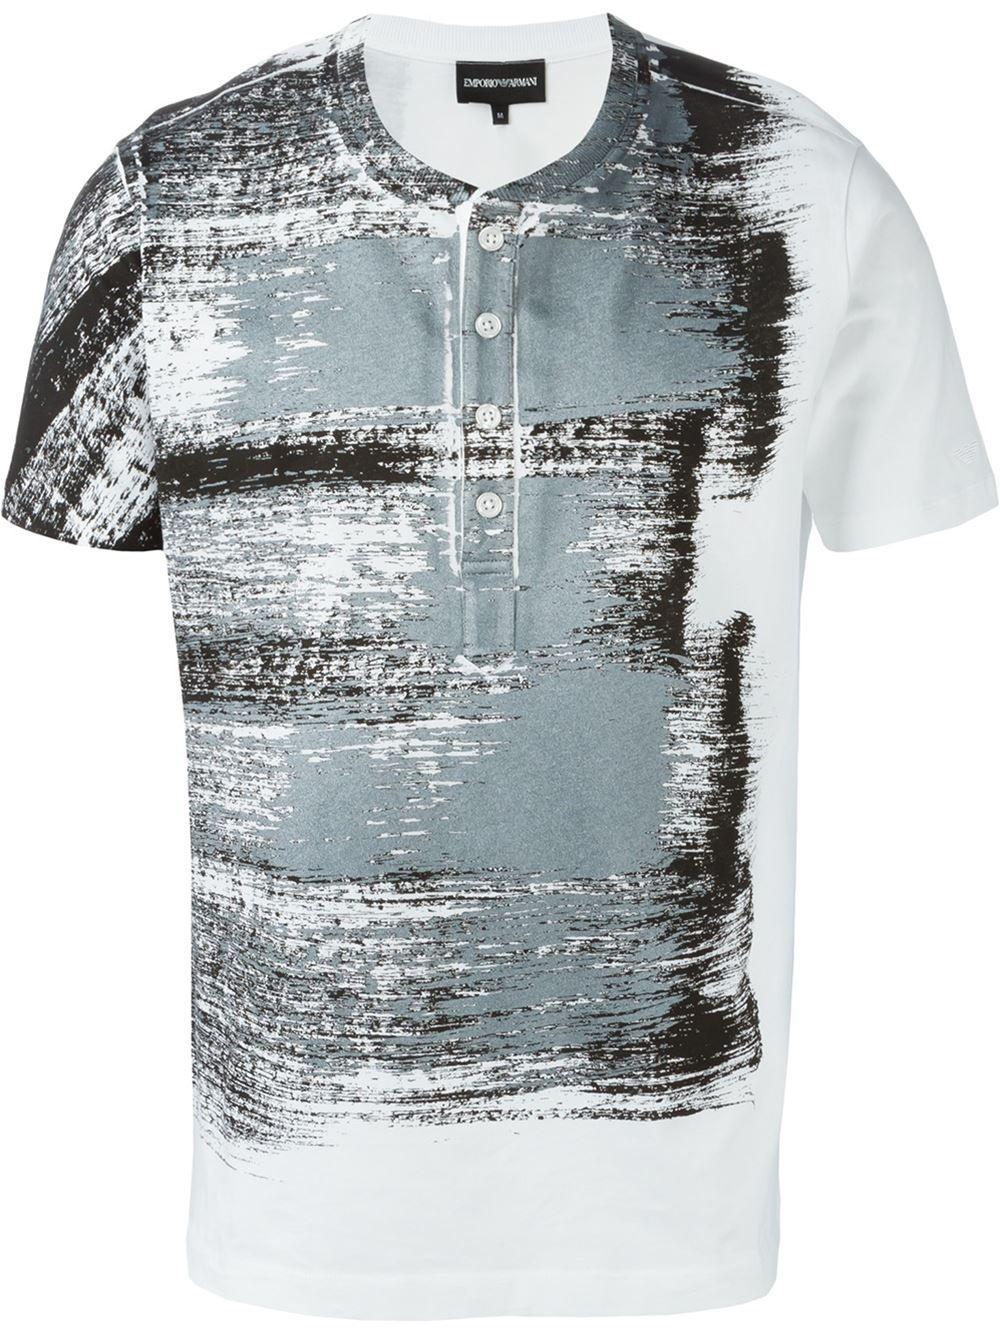 CAMISAS - Camisas Tessabit Como 9oLt8XyzH